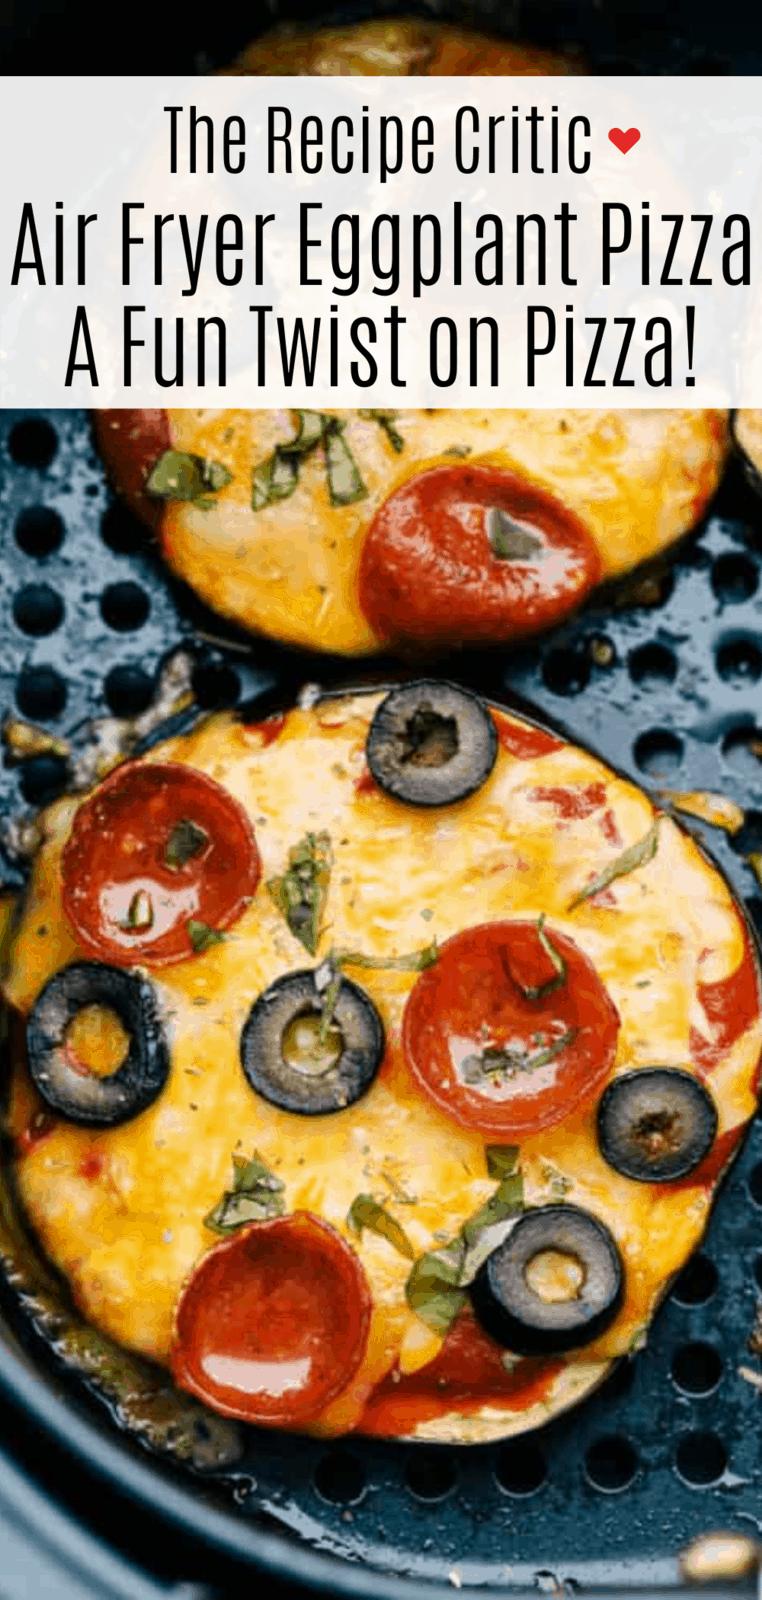 Air Fryer Eggplant Pizza 2